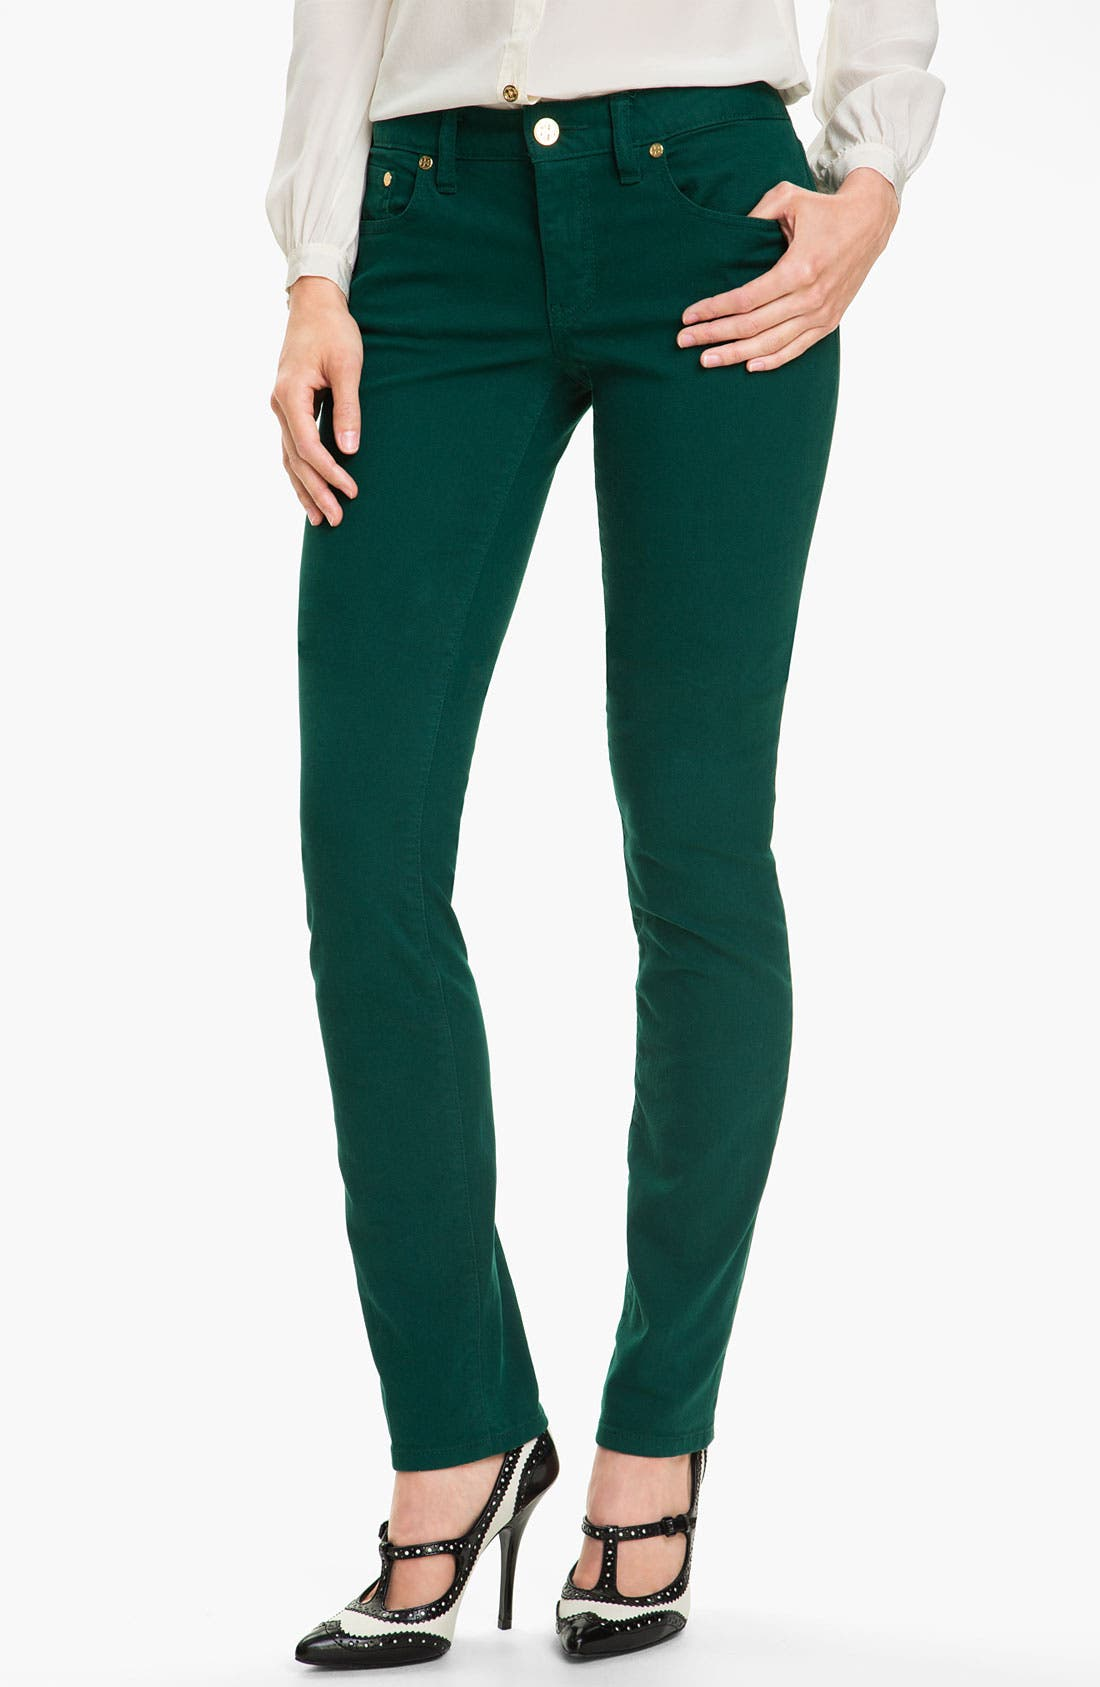 Main Image - Tory Burch 'Ivy' Skinny Stretch Jeans